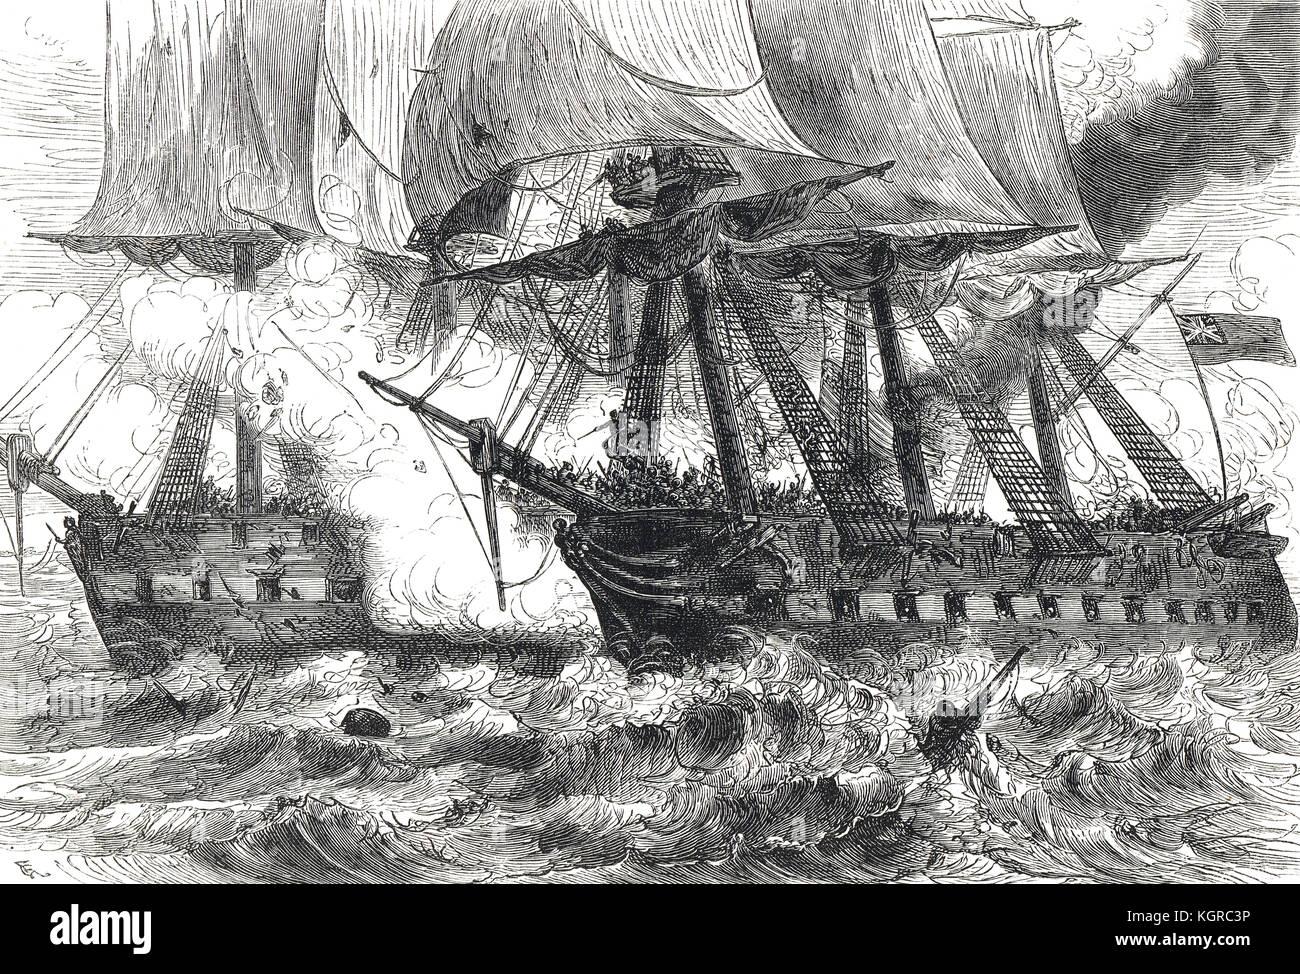 The Battle of Boston Harbor, 1 June 1813, Capture of USS Chesapeake, War of 1812 Stock Photo